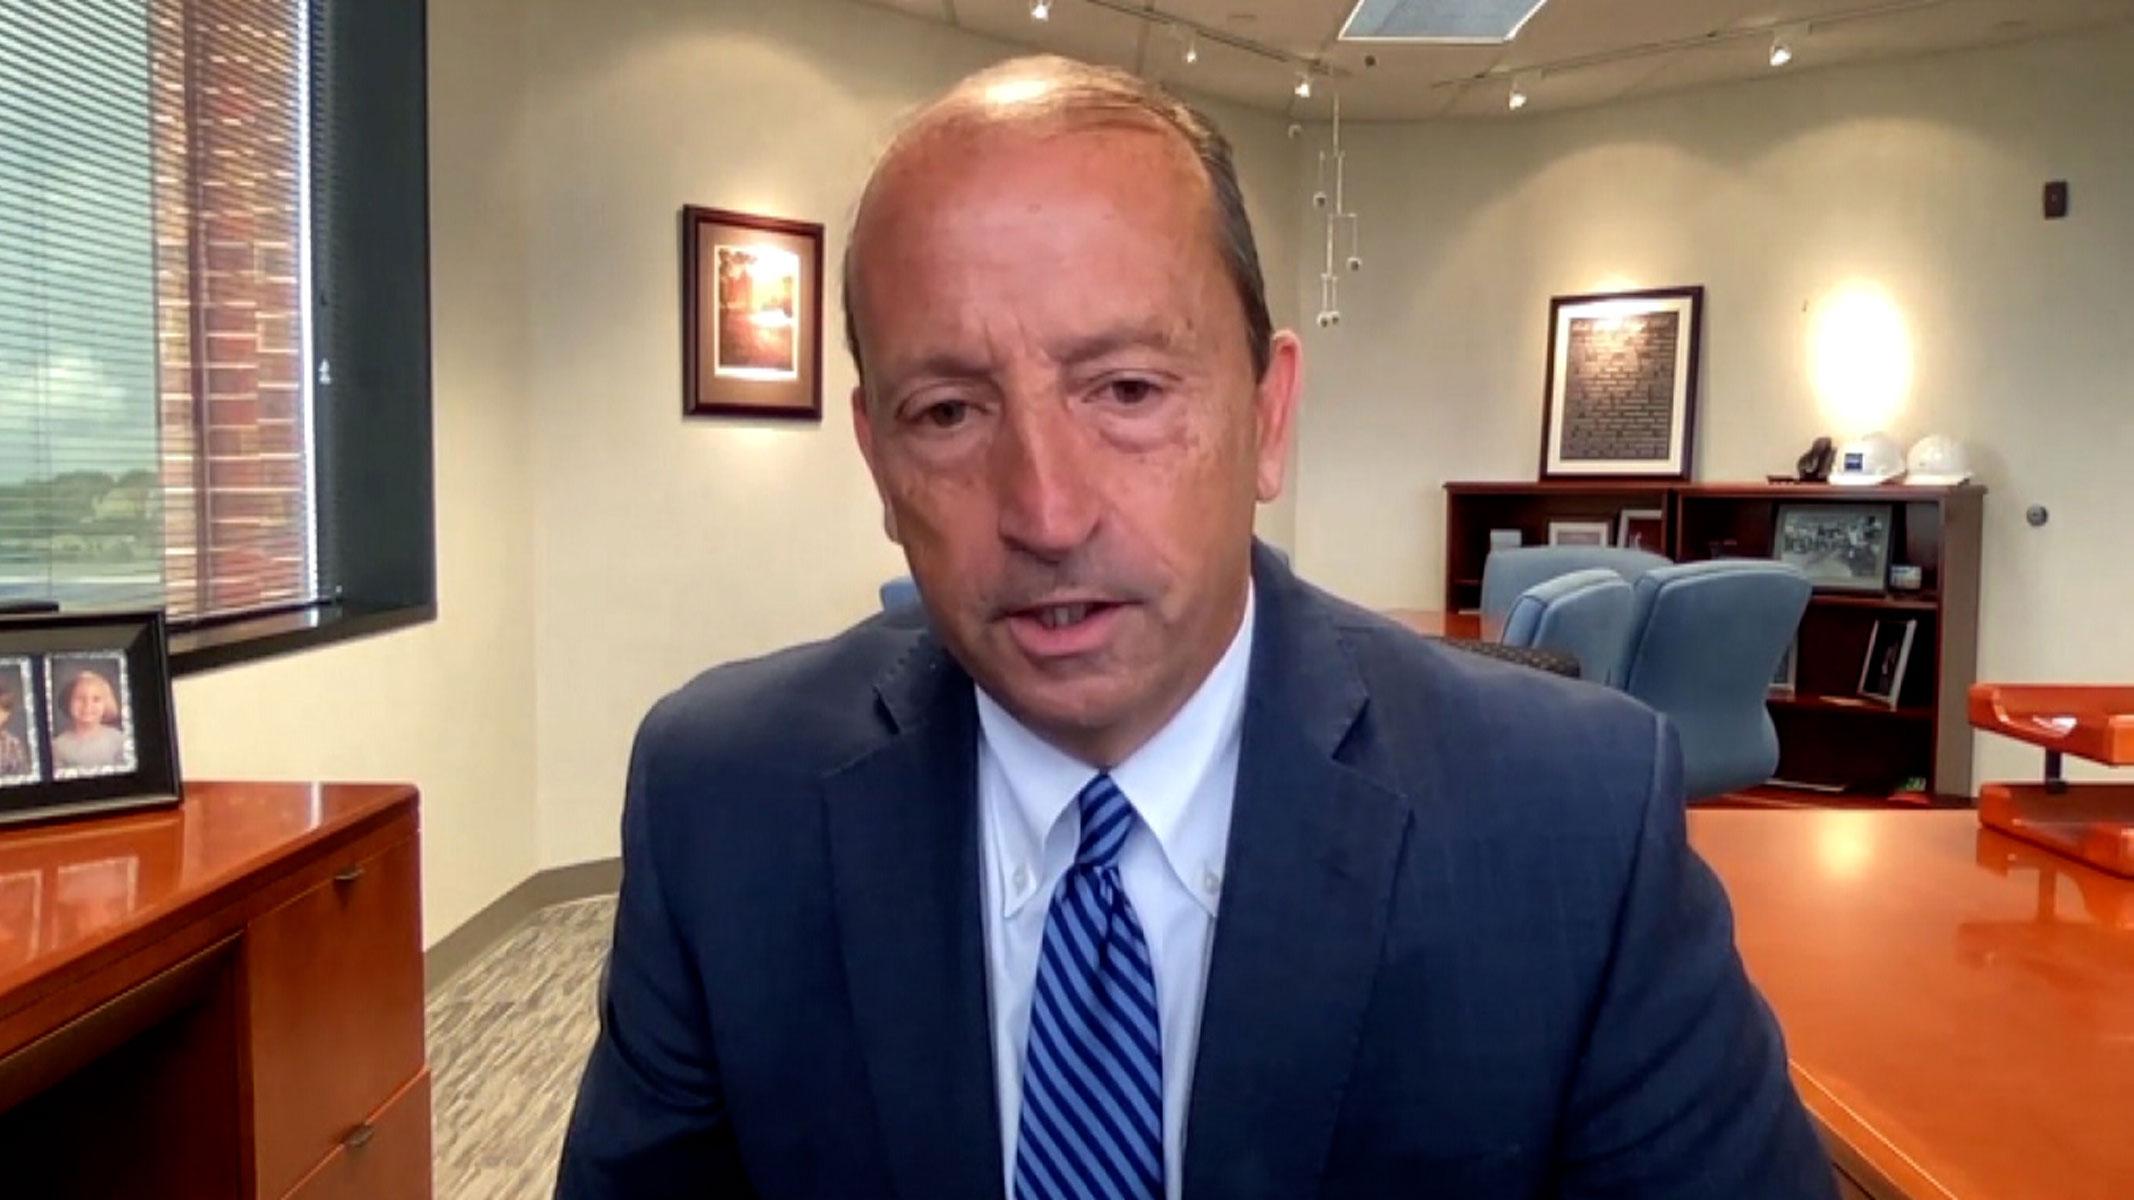 CoxHealth CEO Steve Edwards talks to CNN on Monday.